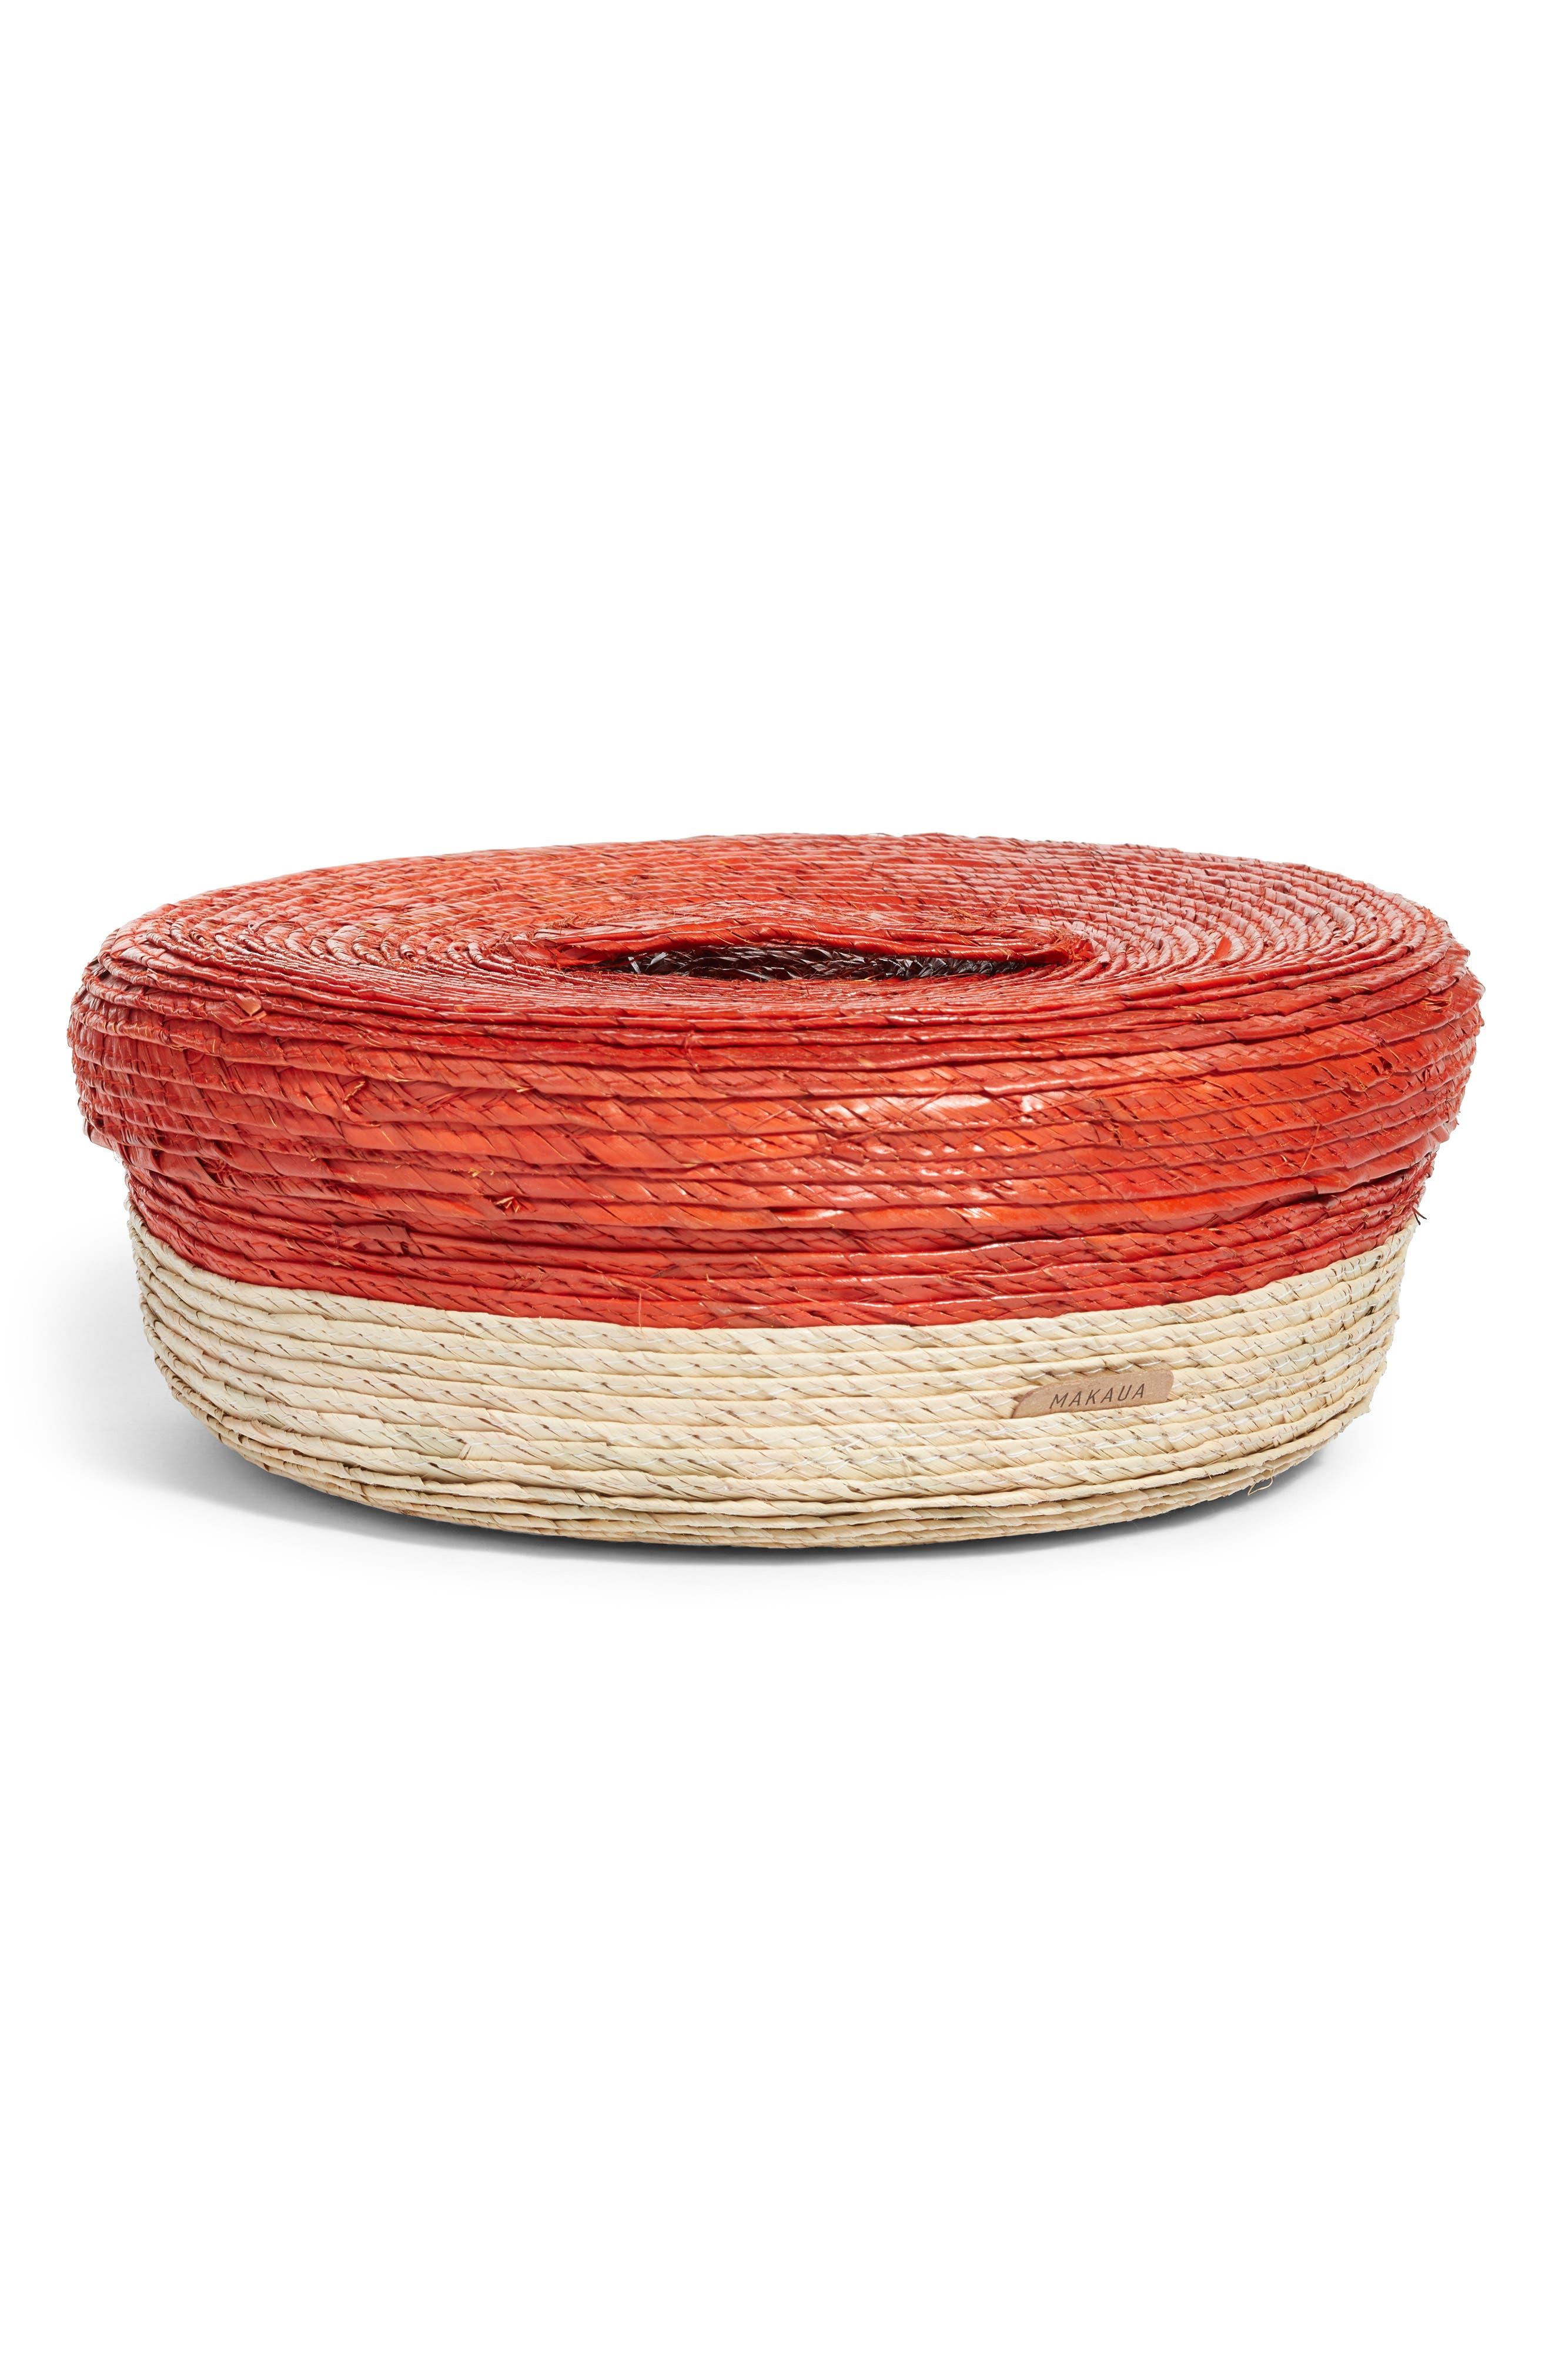 Tortillero Basket,                         Main,                         color,